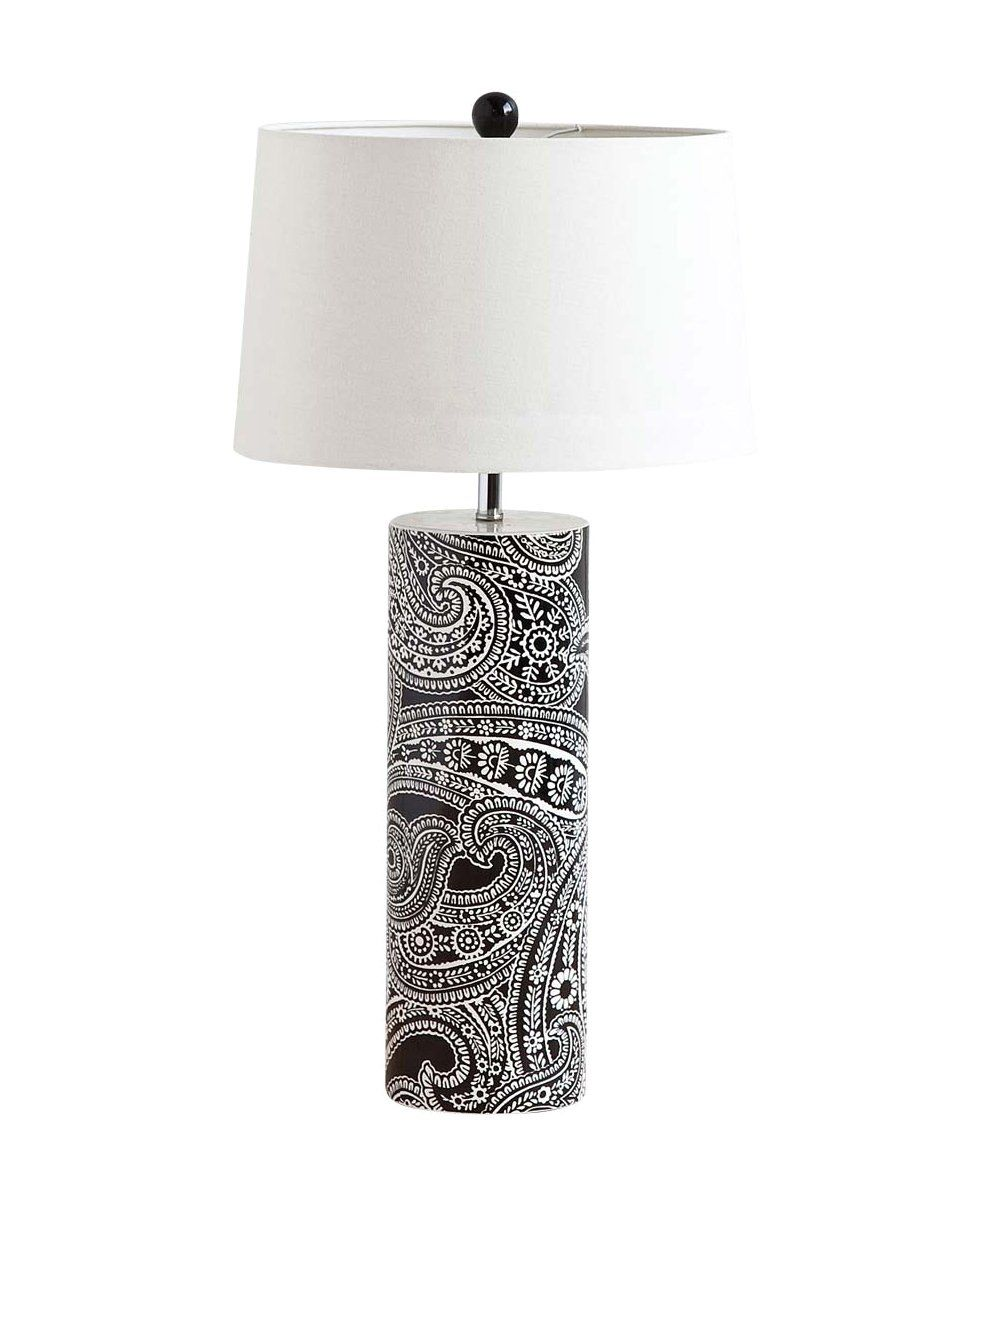 Mercana Mucura I 1-Light Table Lamp, Black at MYHABIT